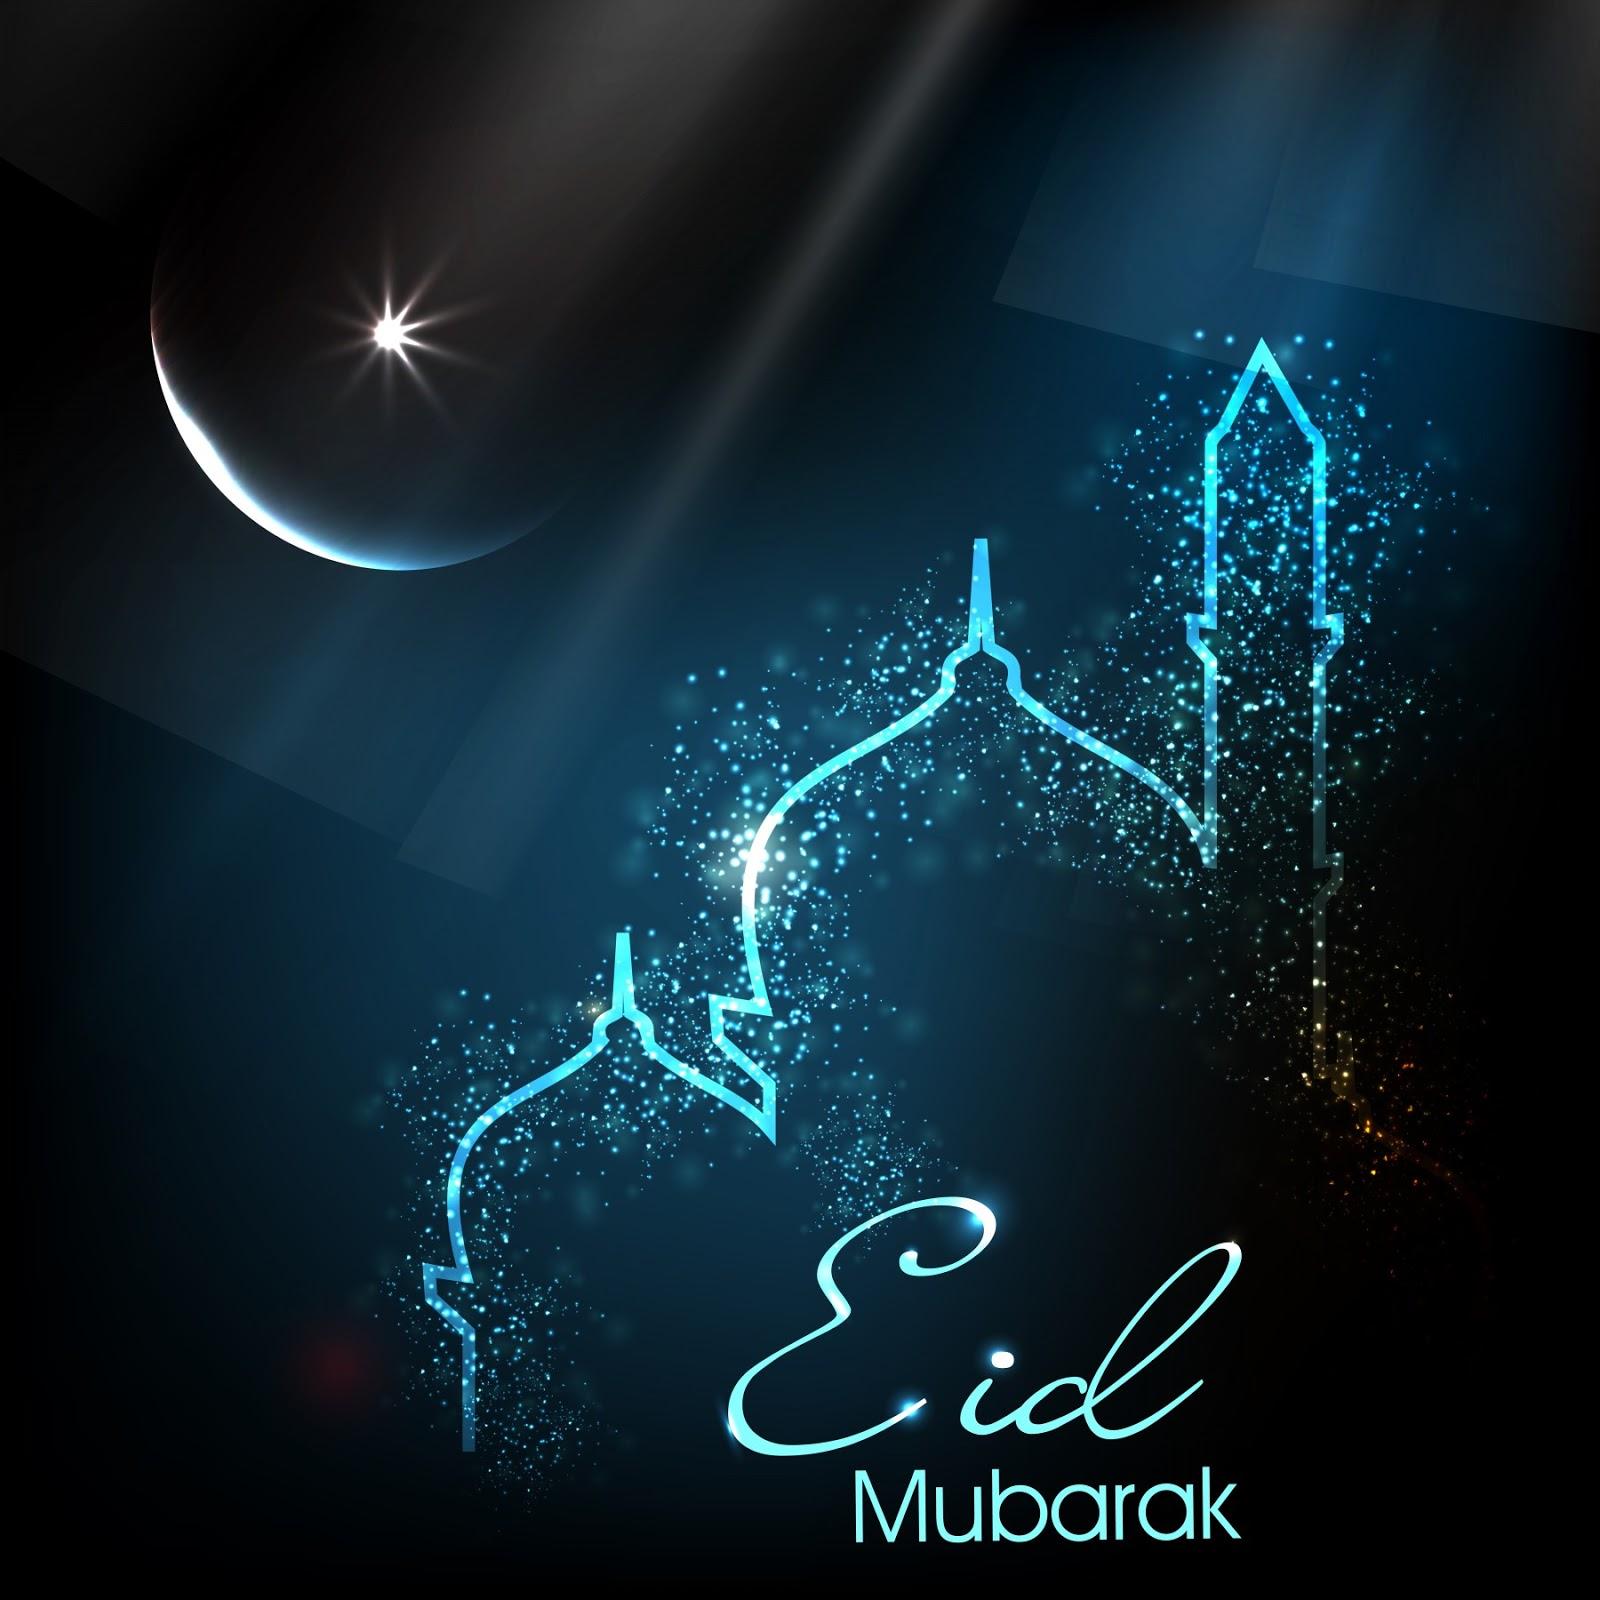 Eid Ramadan Mubarak 2018 Hd Wallpapers Images Cover Eid Ul Fitr